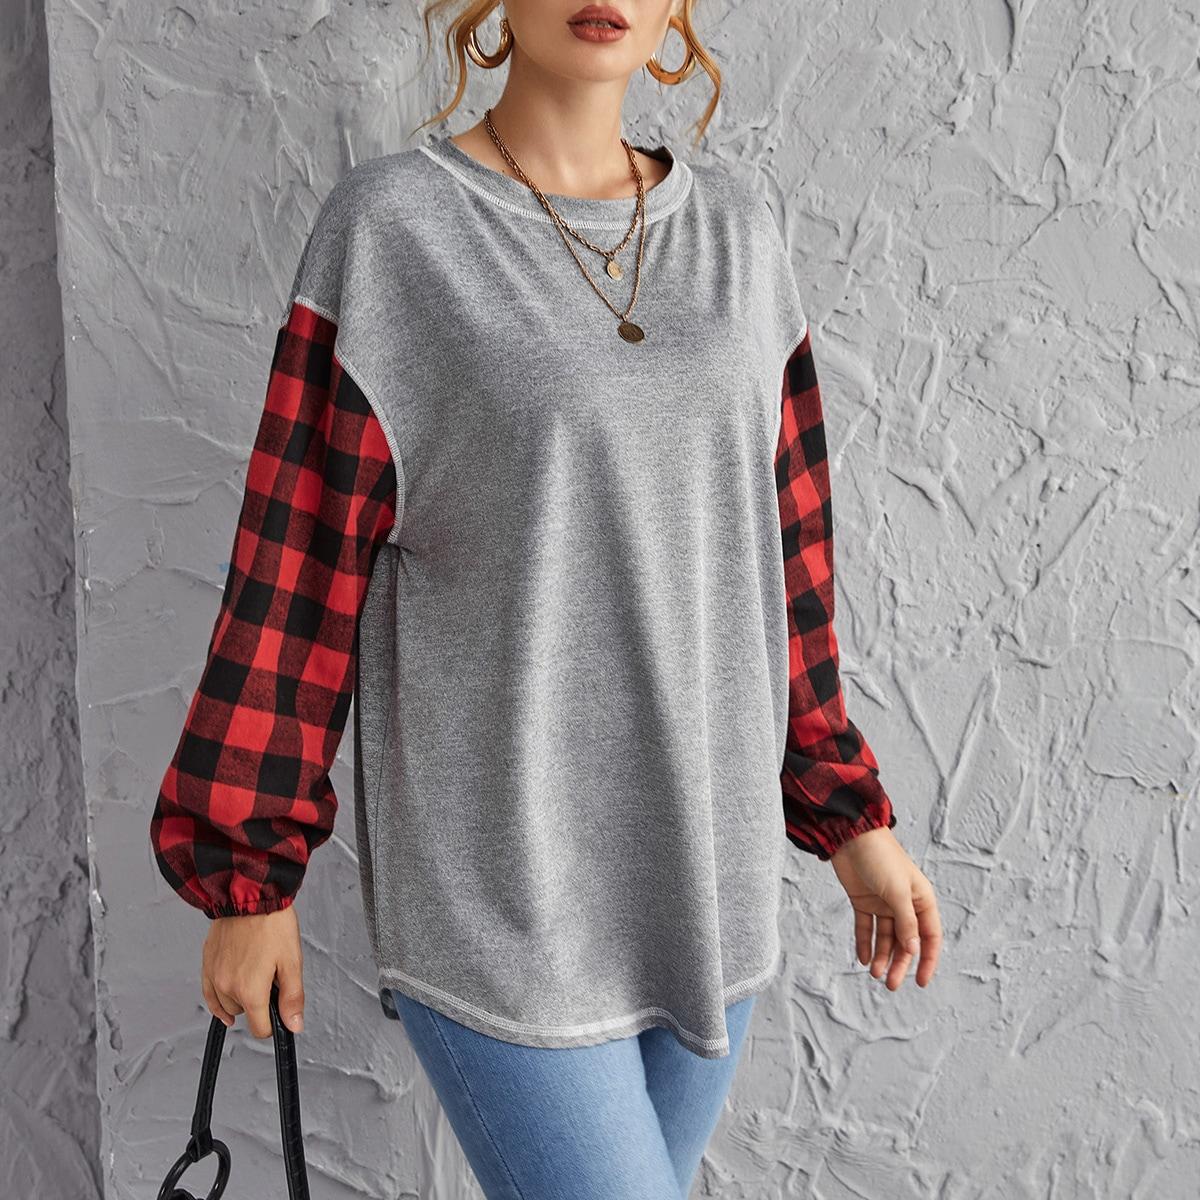 SHEIN / Drop Shoulder Buffalo Plaid Sleeve Pullover